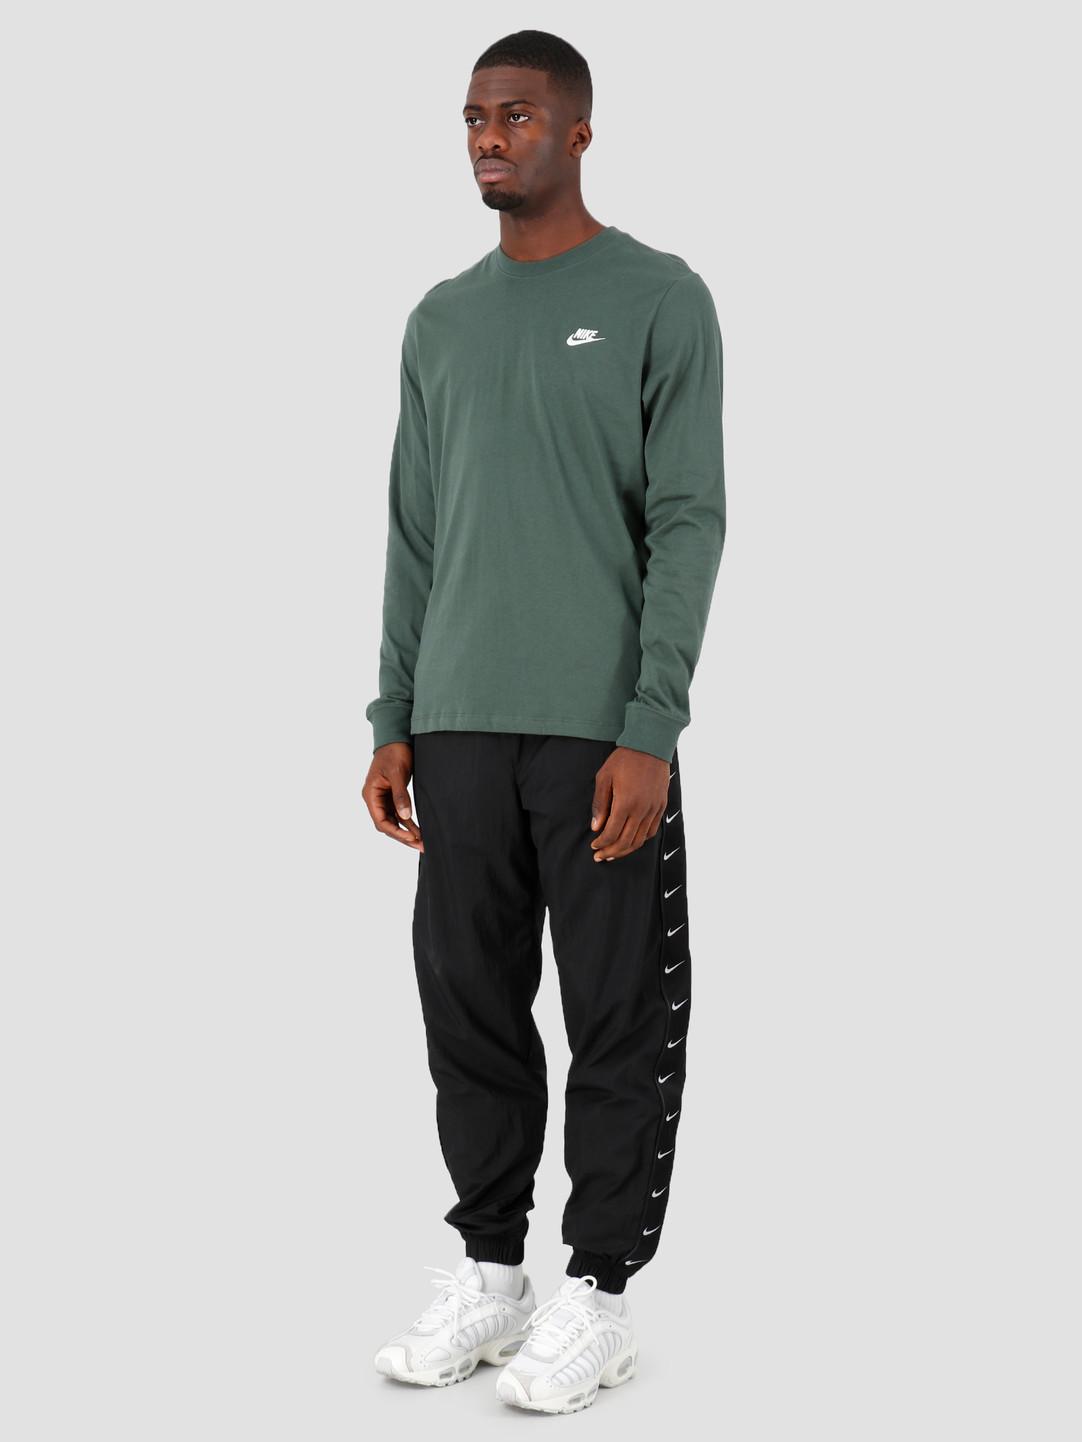 Nike Nike Sportswear Longsleeve Galactic Jade White Ar5193-337